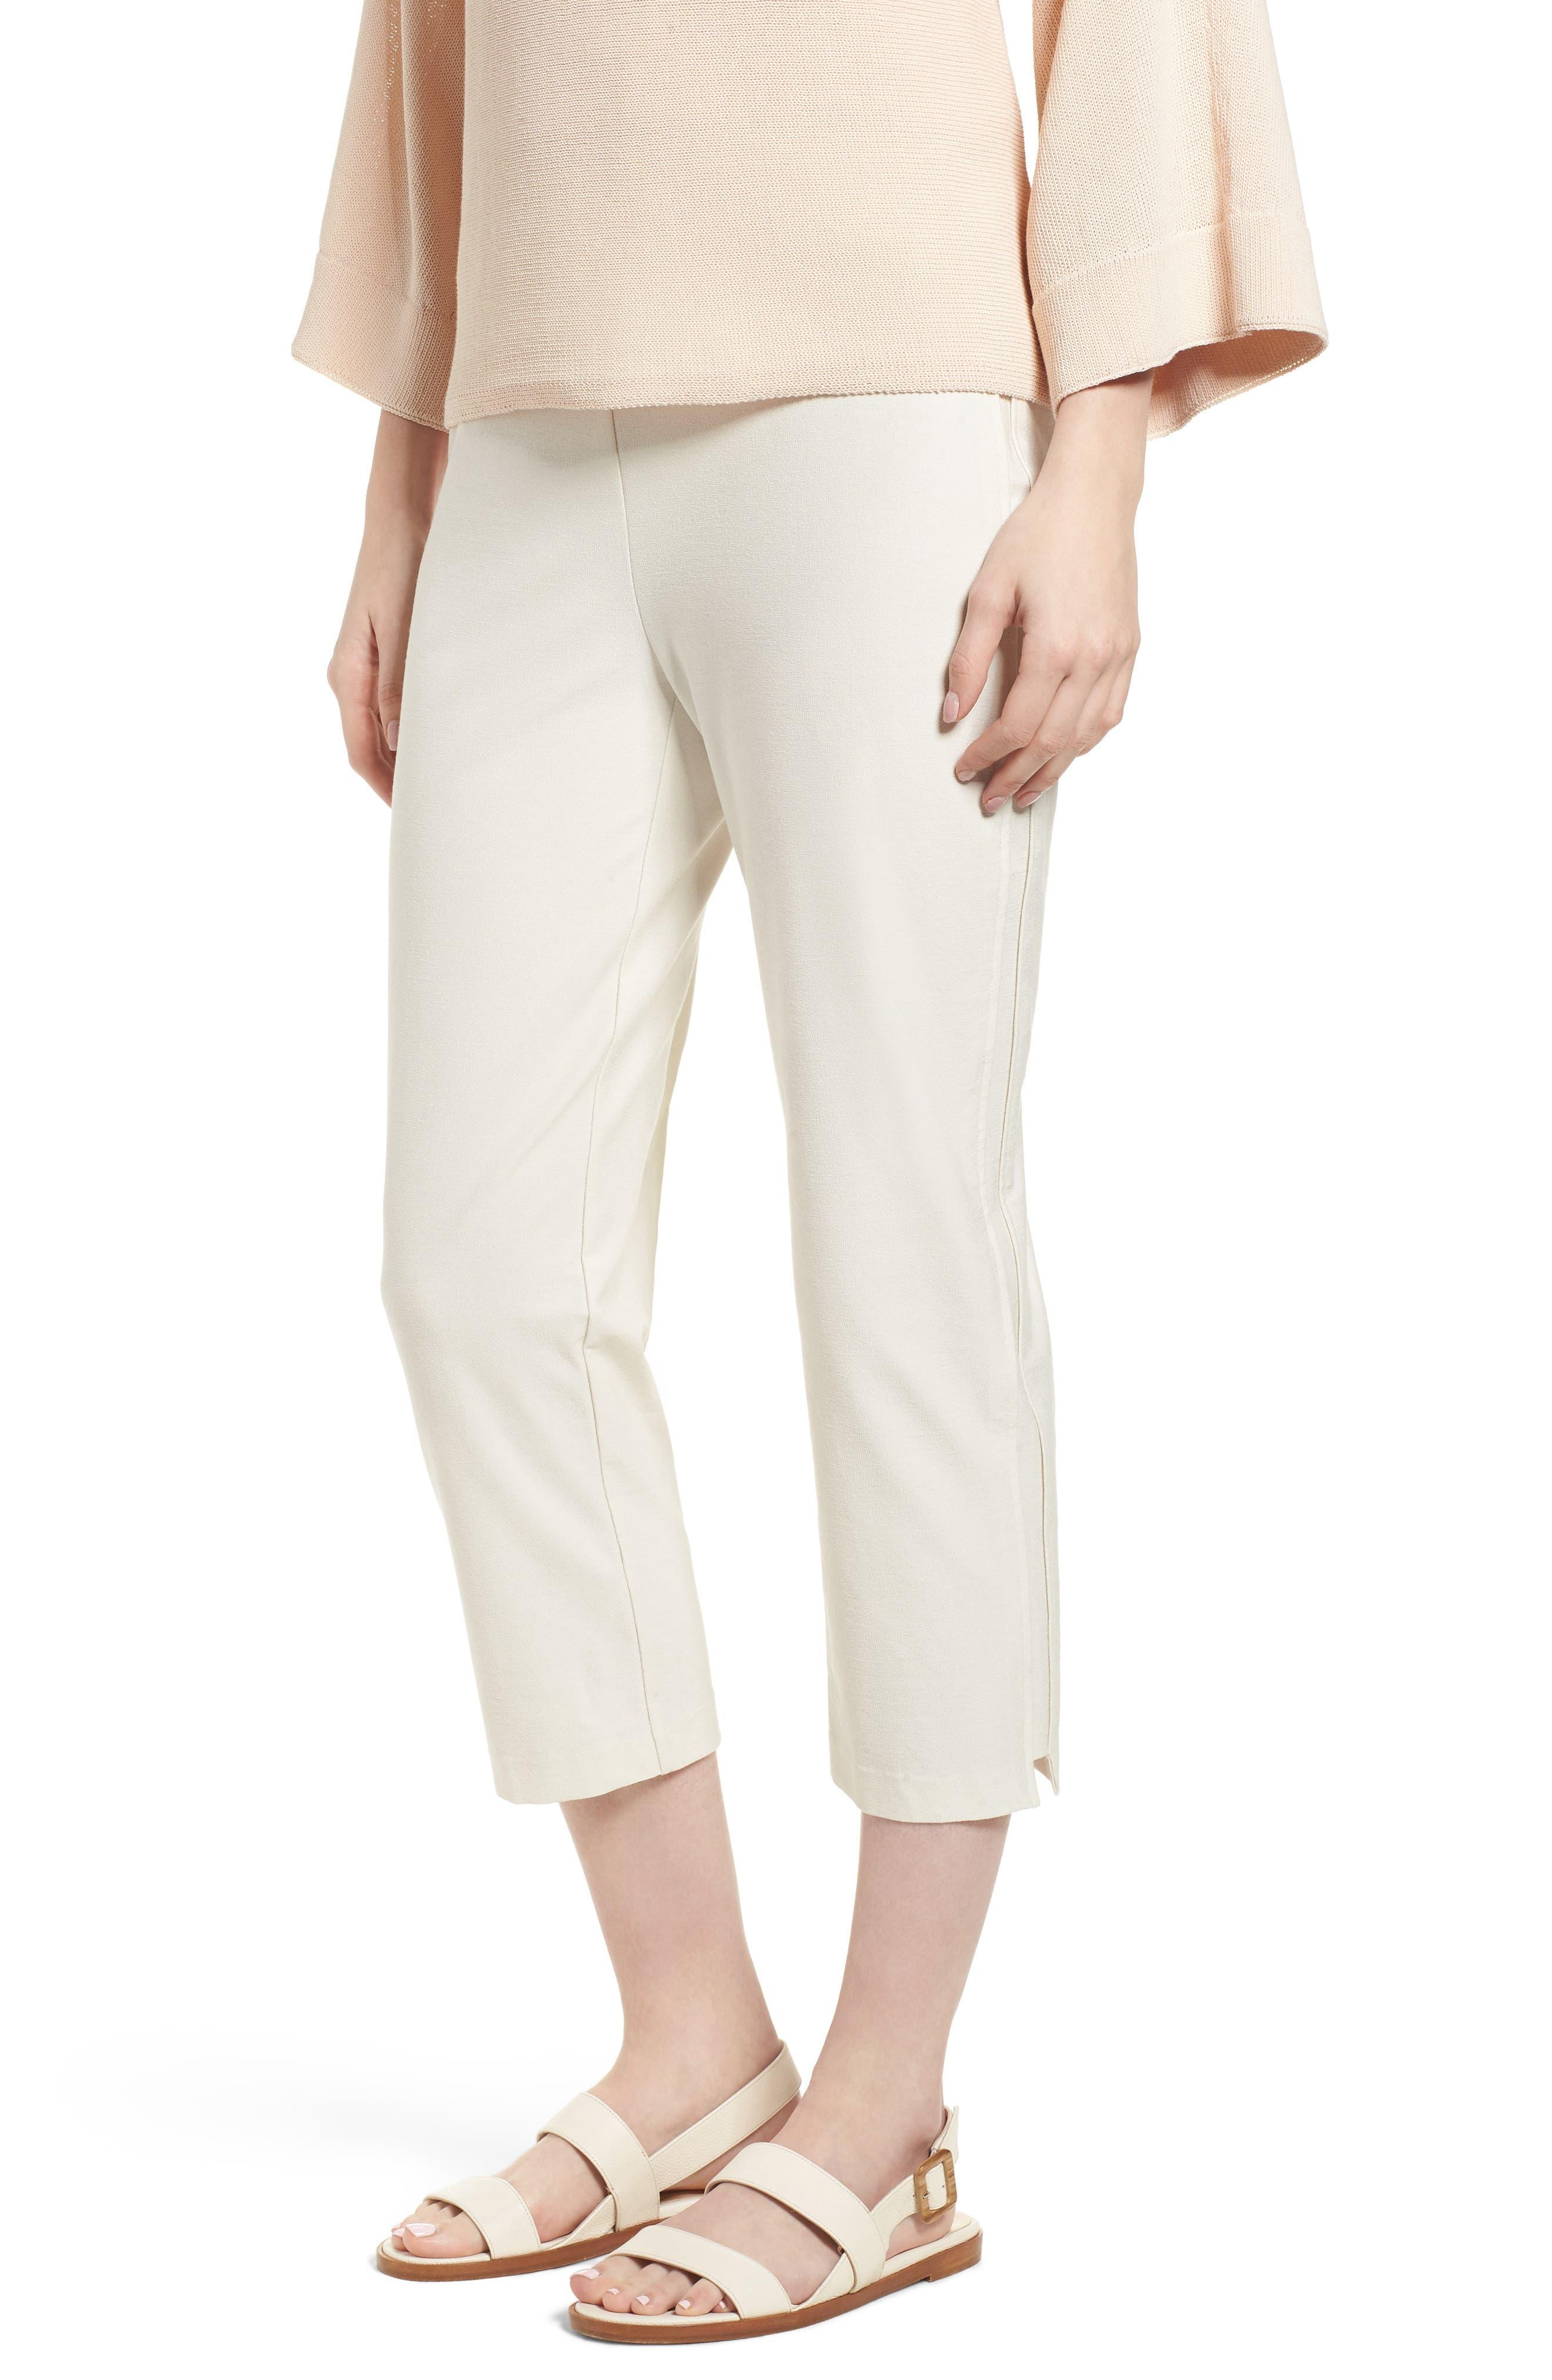 Eileen Fisher Foldover Waist Stretch Crepe Capri Pants